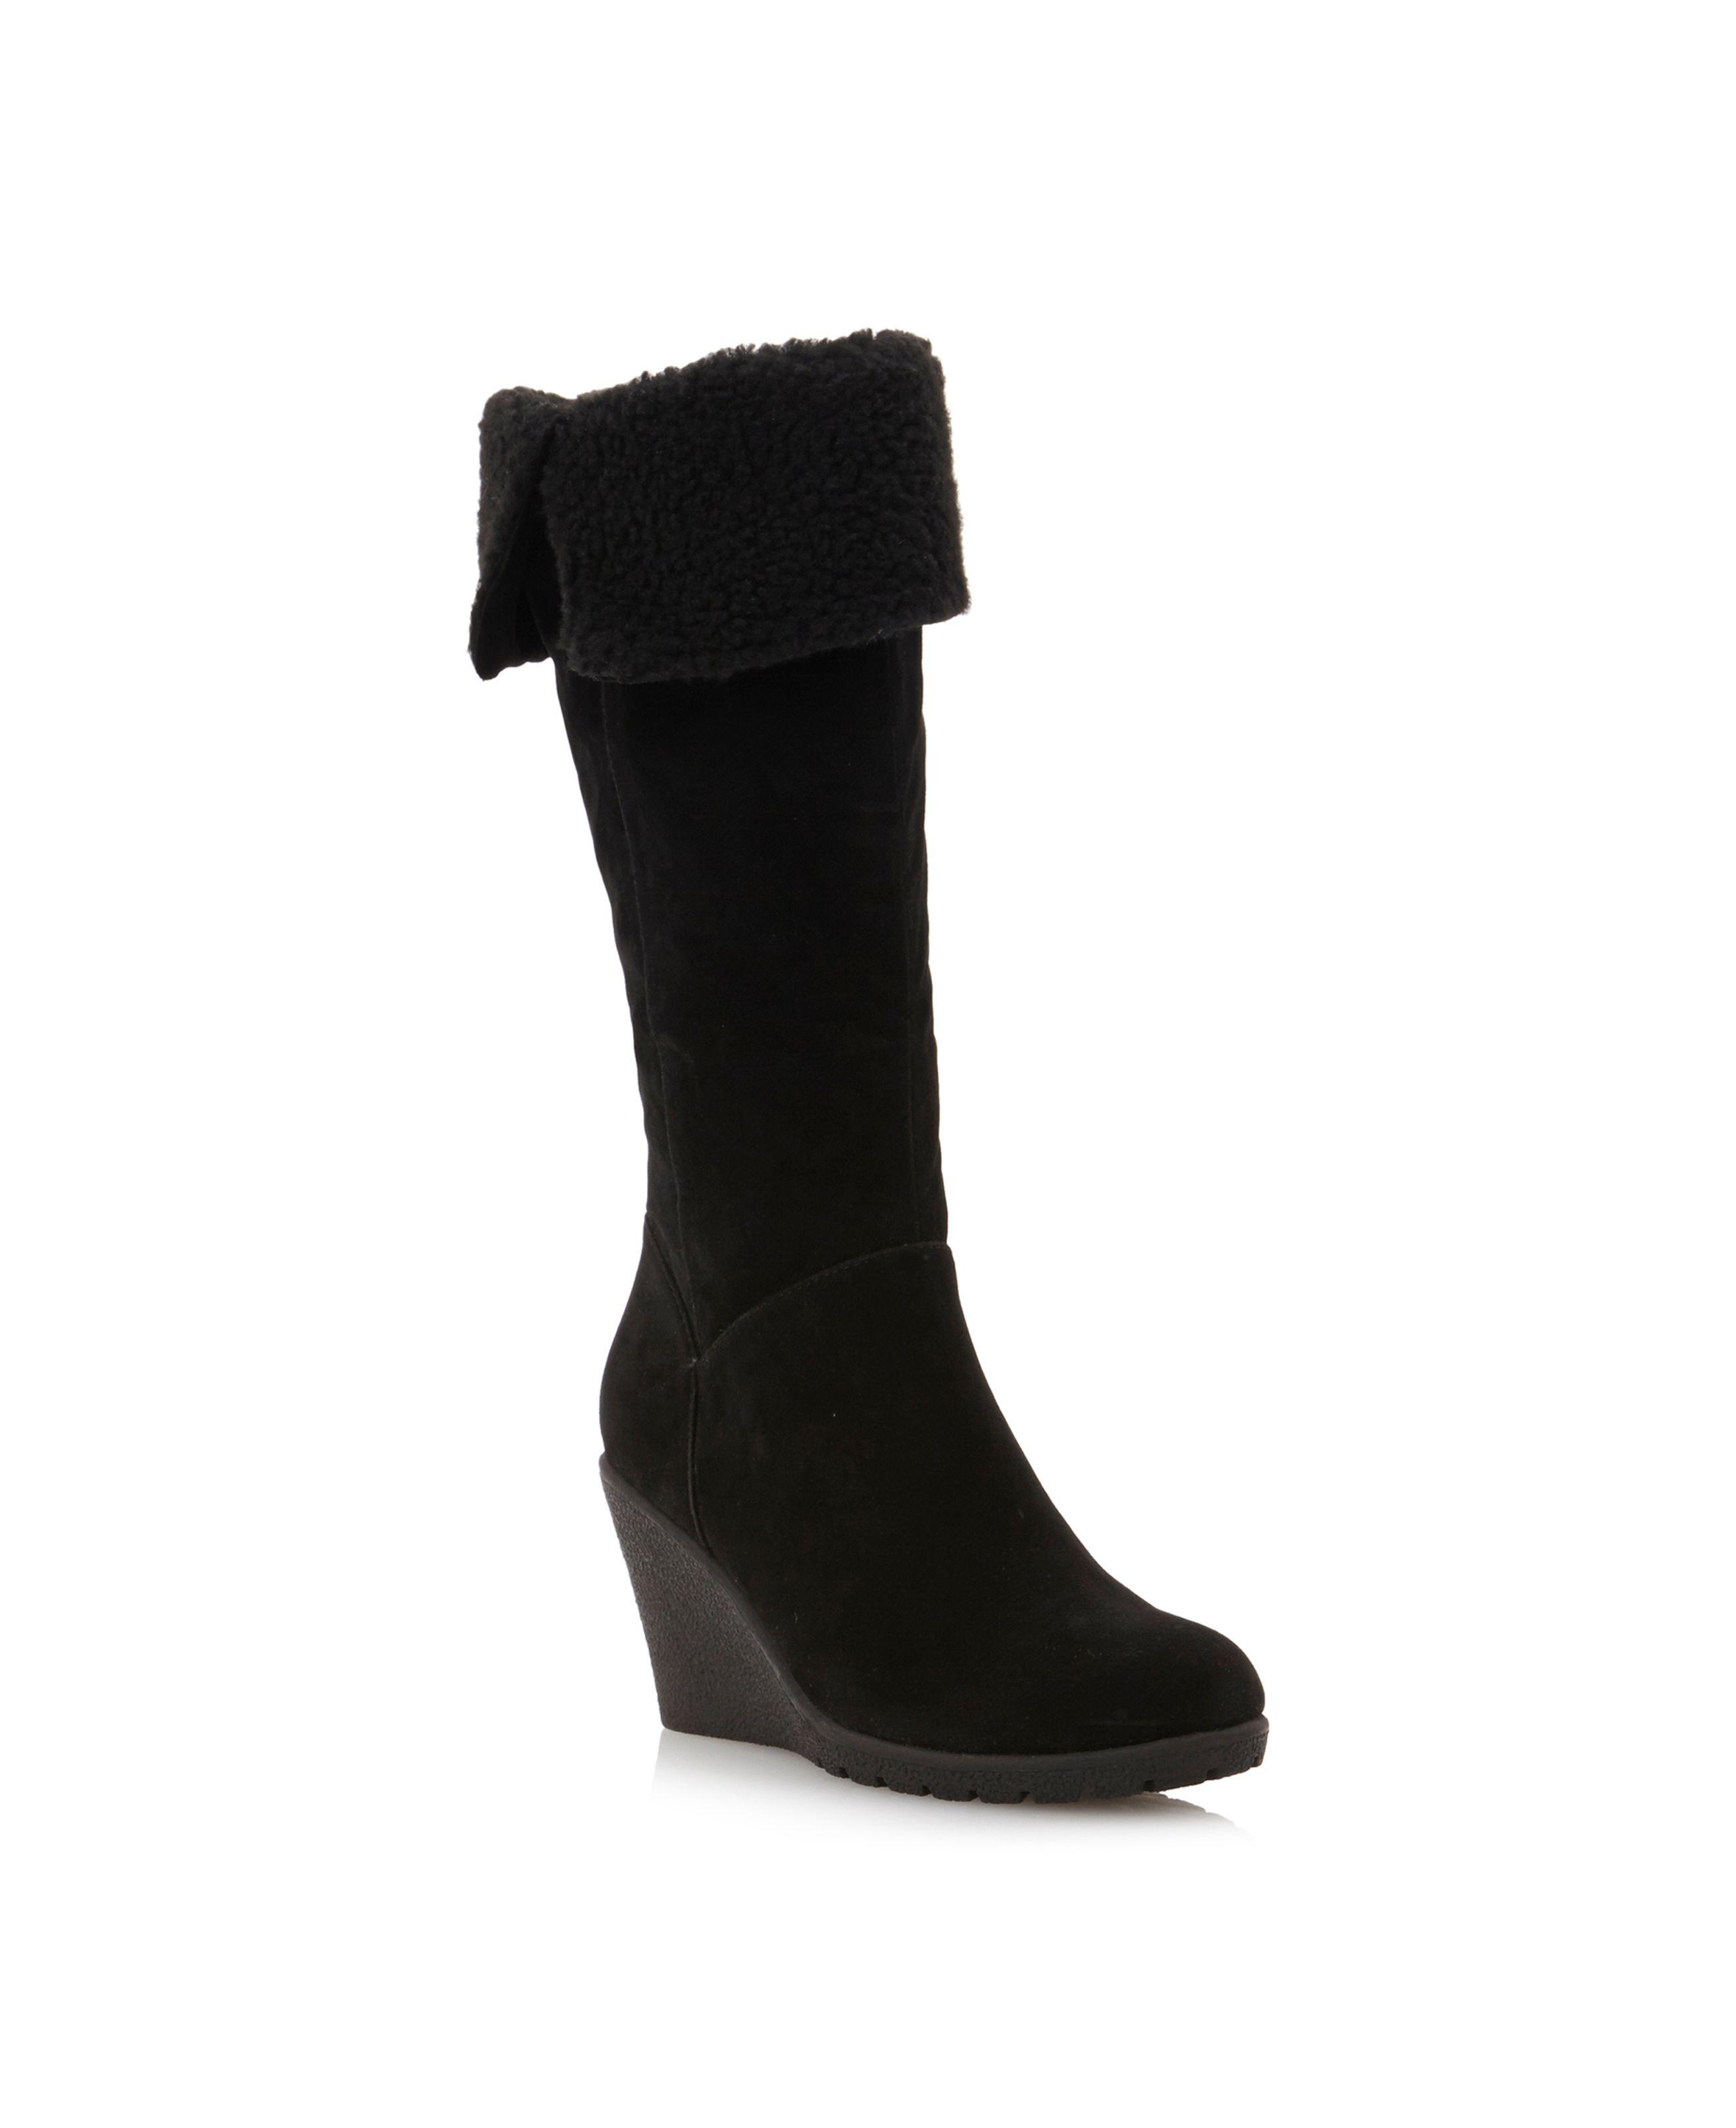 linea tahiti crepe sole wedge hi leg boots in black lyst